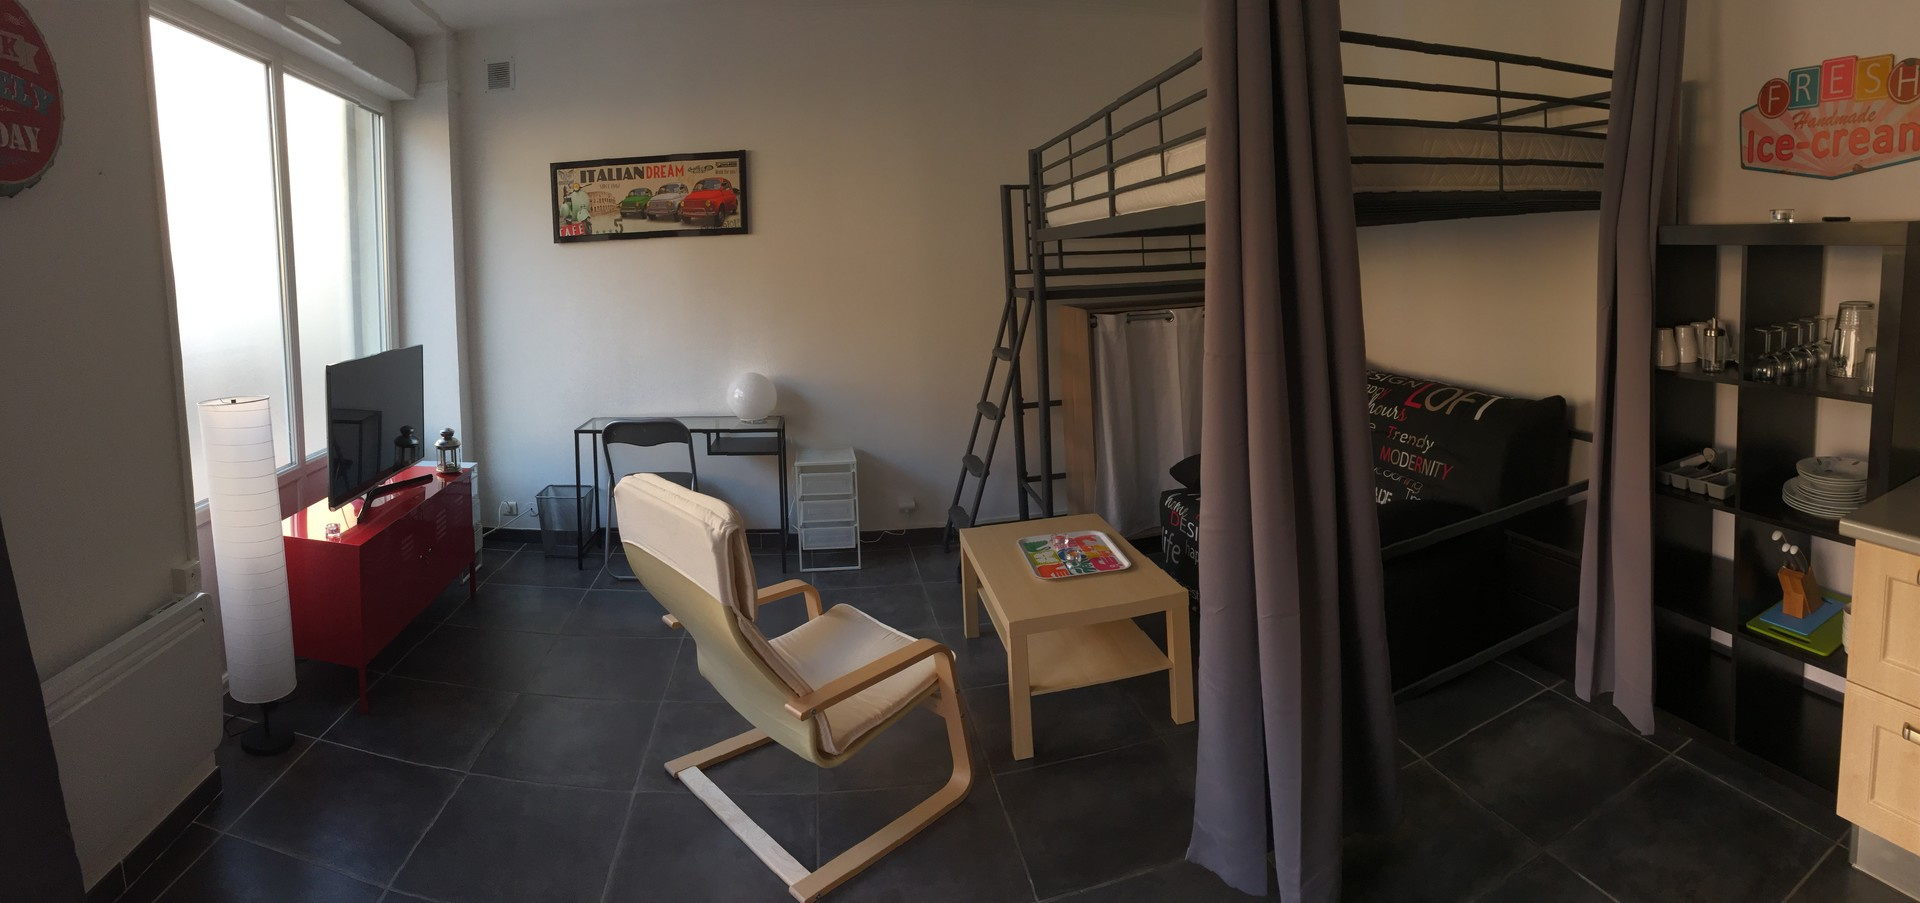 avignon-intra-muros-grand-studio-lumineux-climatise-totalement-renove-meuble-de-neuf-baea4555e94576be98221a3c732334e8